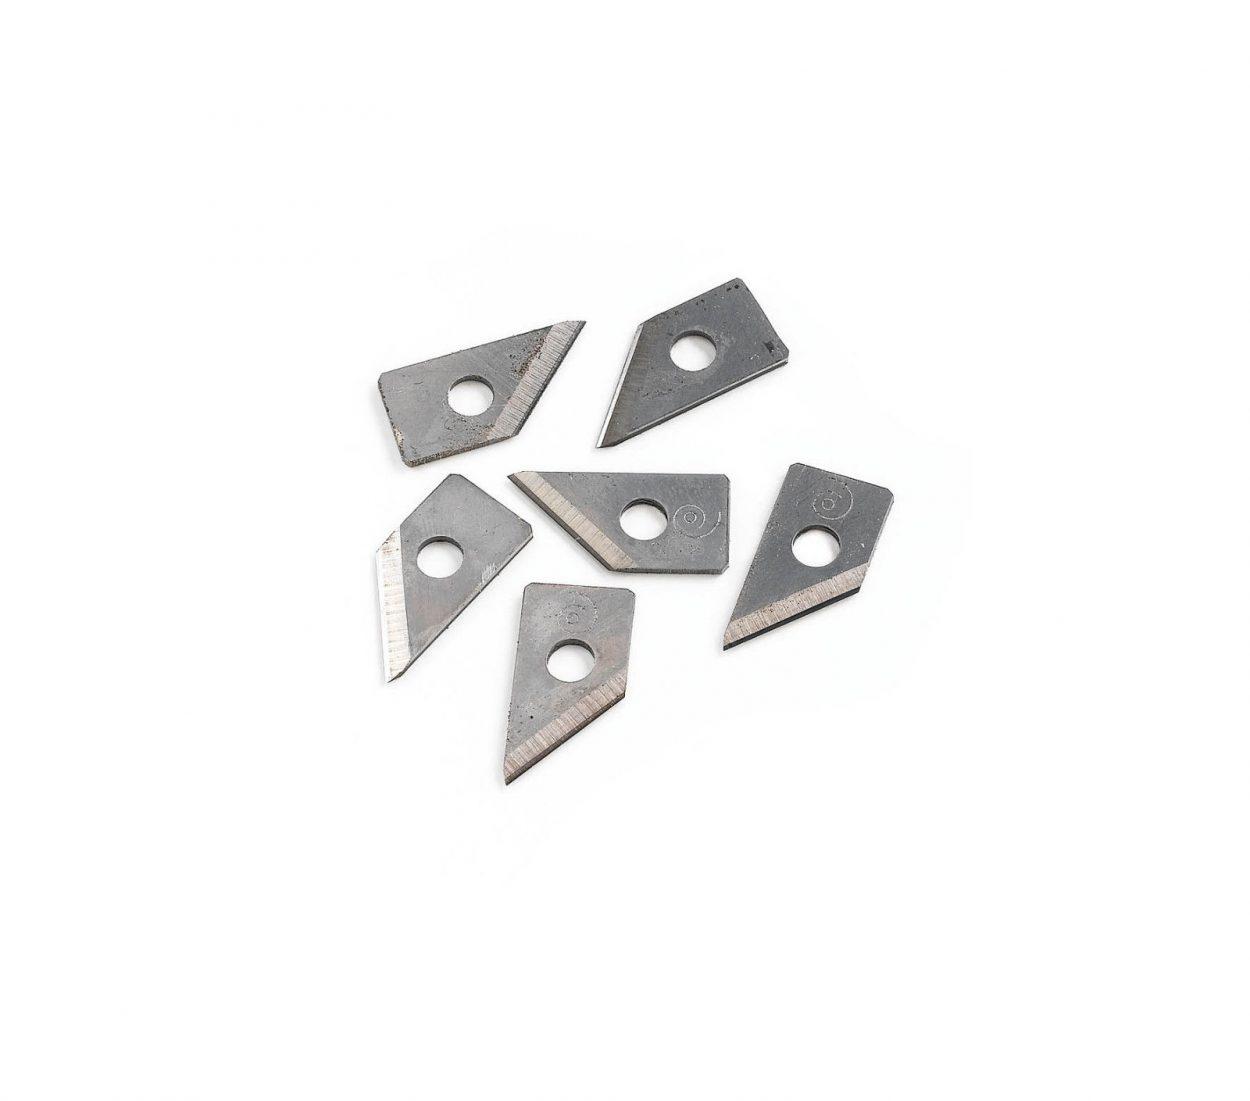 Circle Cutter Spare Blades